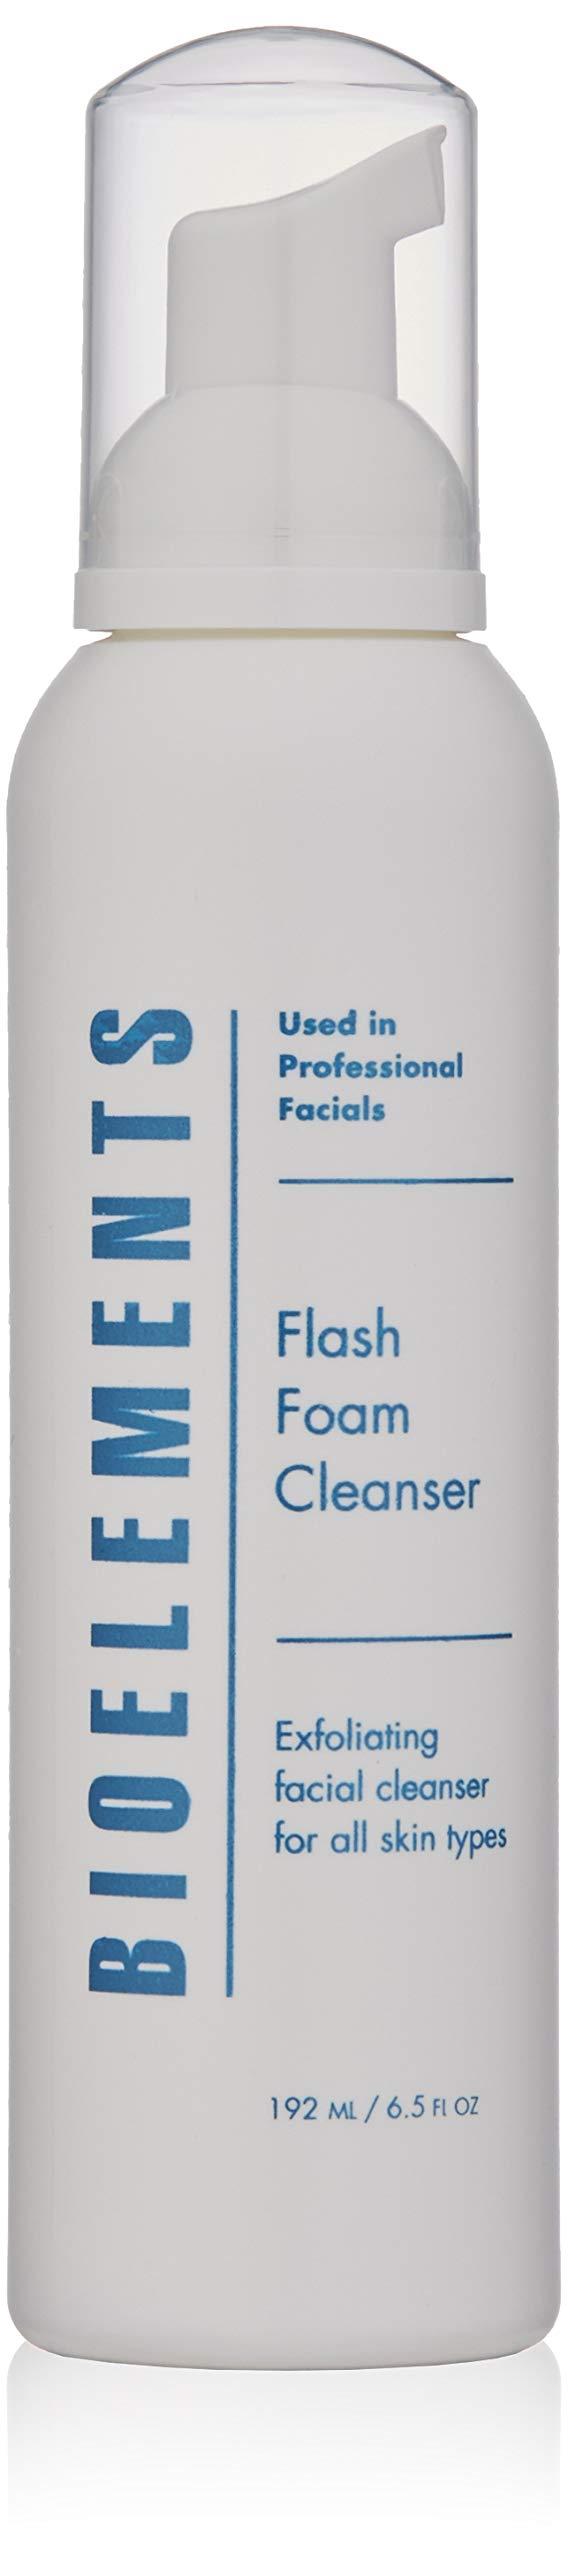 Bioelements Flash Foam Cleanser, 6.5-Ounce